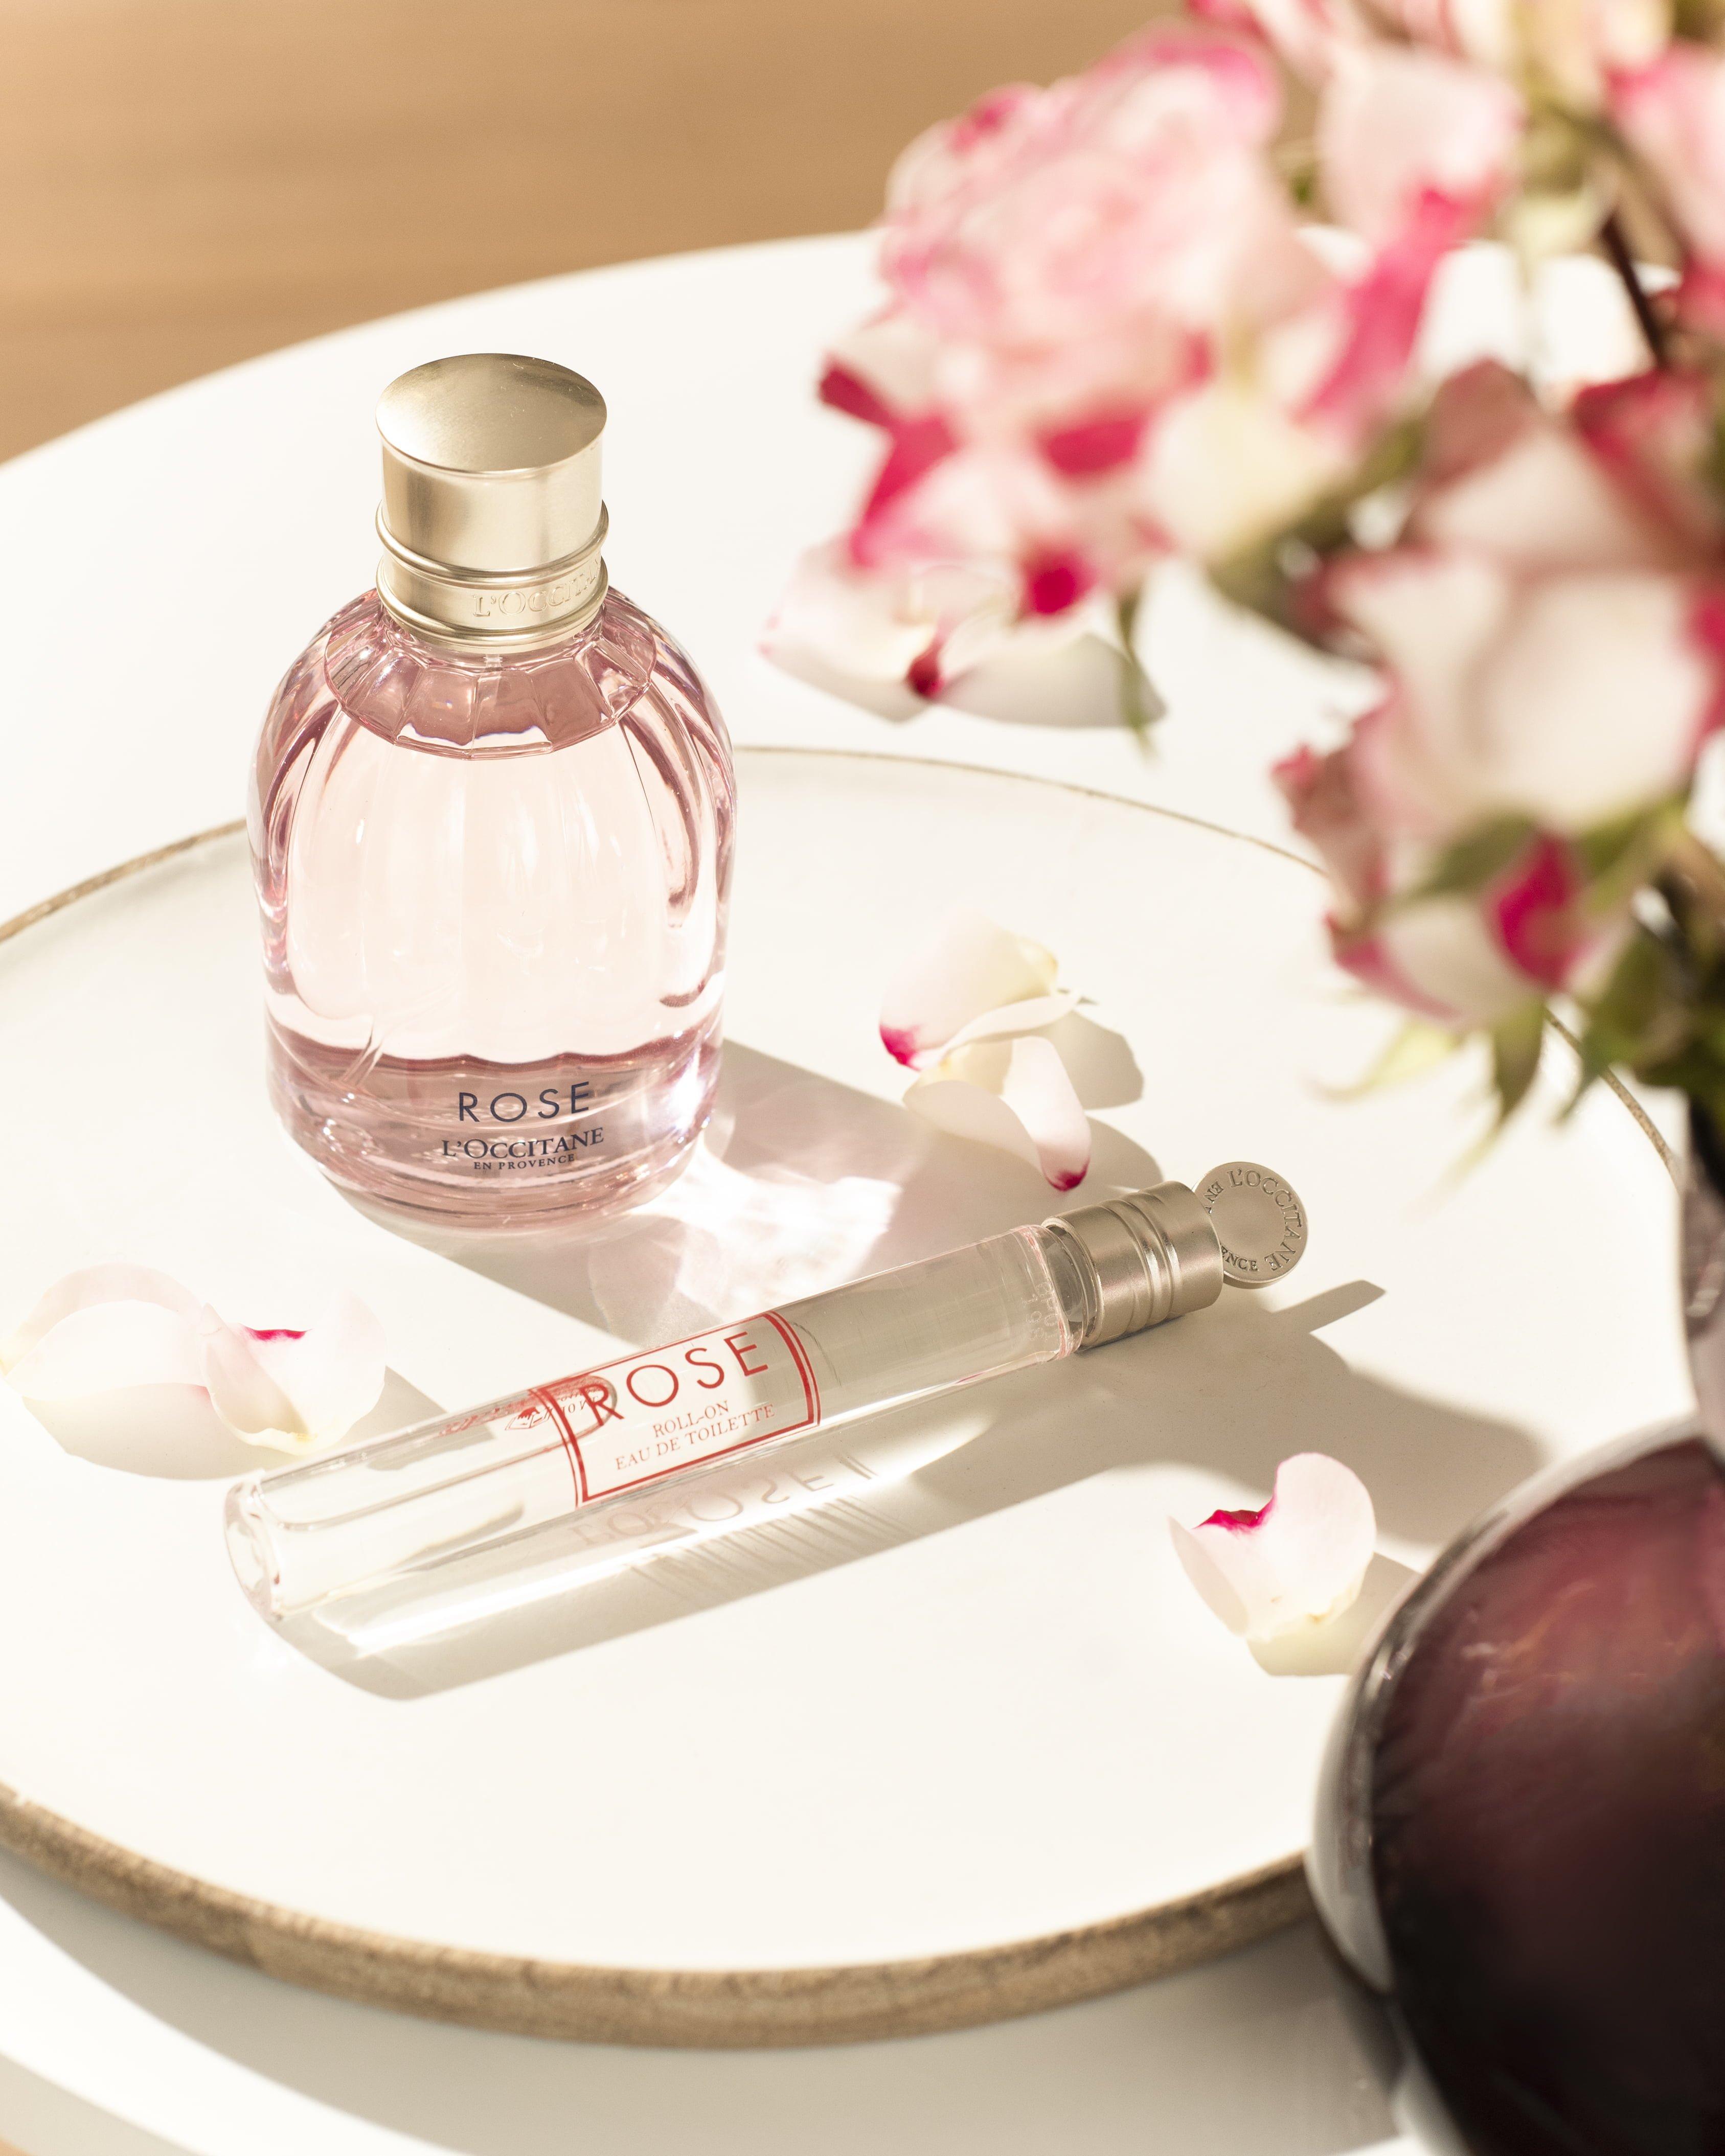 Novi parfem na bazi ruže iz L'OCCITANE-a dopušta vam da budete kreatori svog mirisa